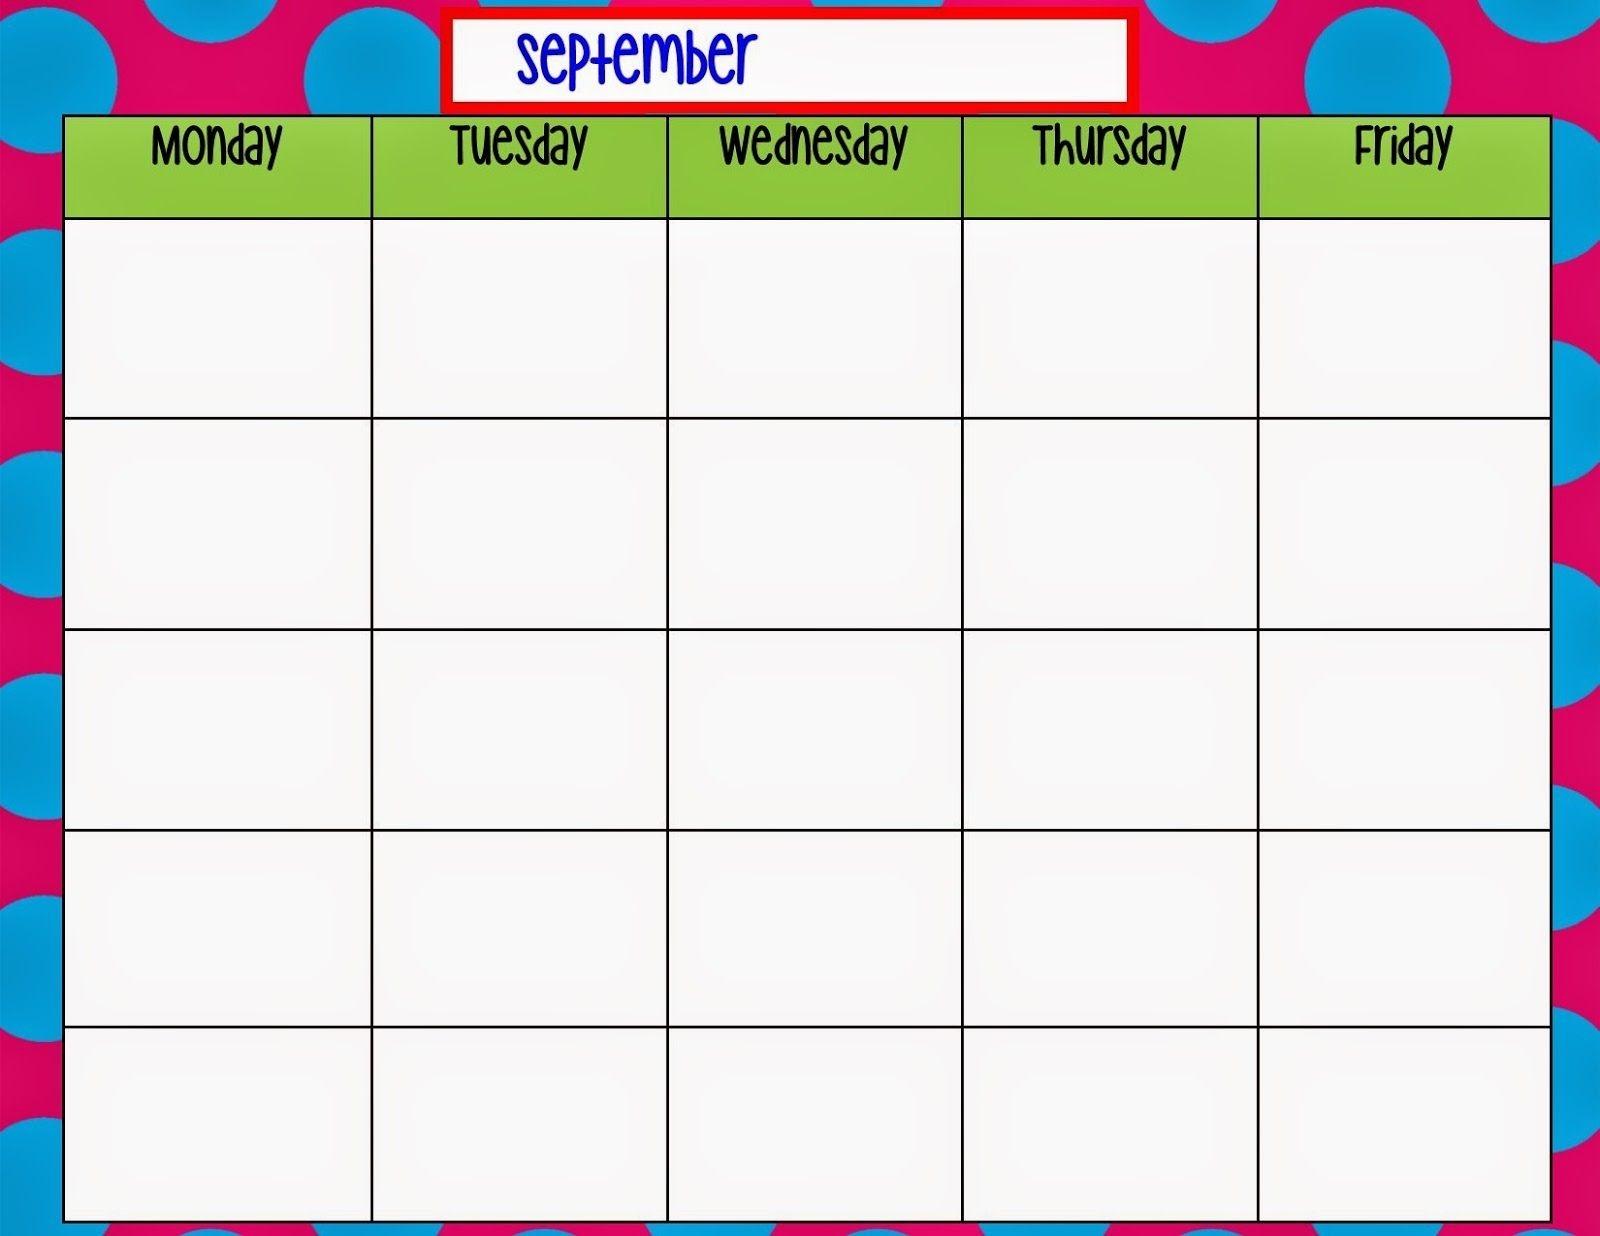 Monday Through Friday Calendar Template | Preschool | Weekly-Monday To Friday Blank Calendar